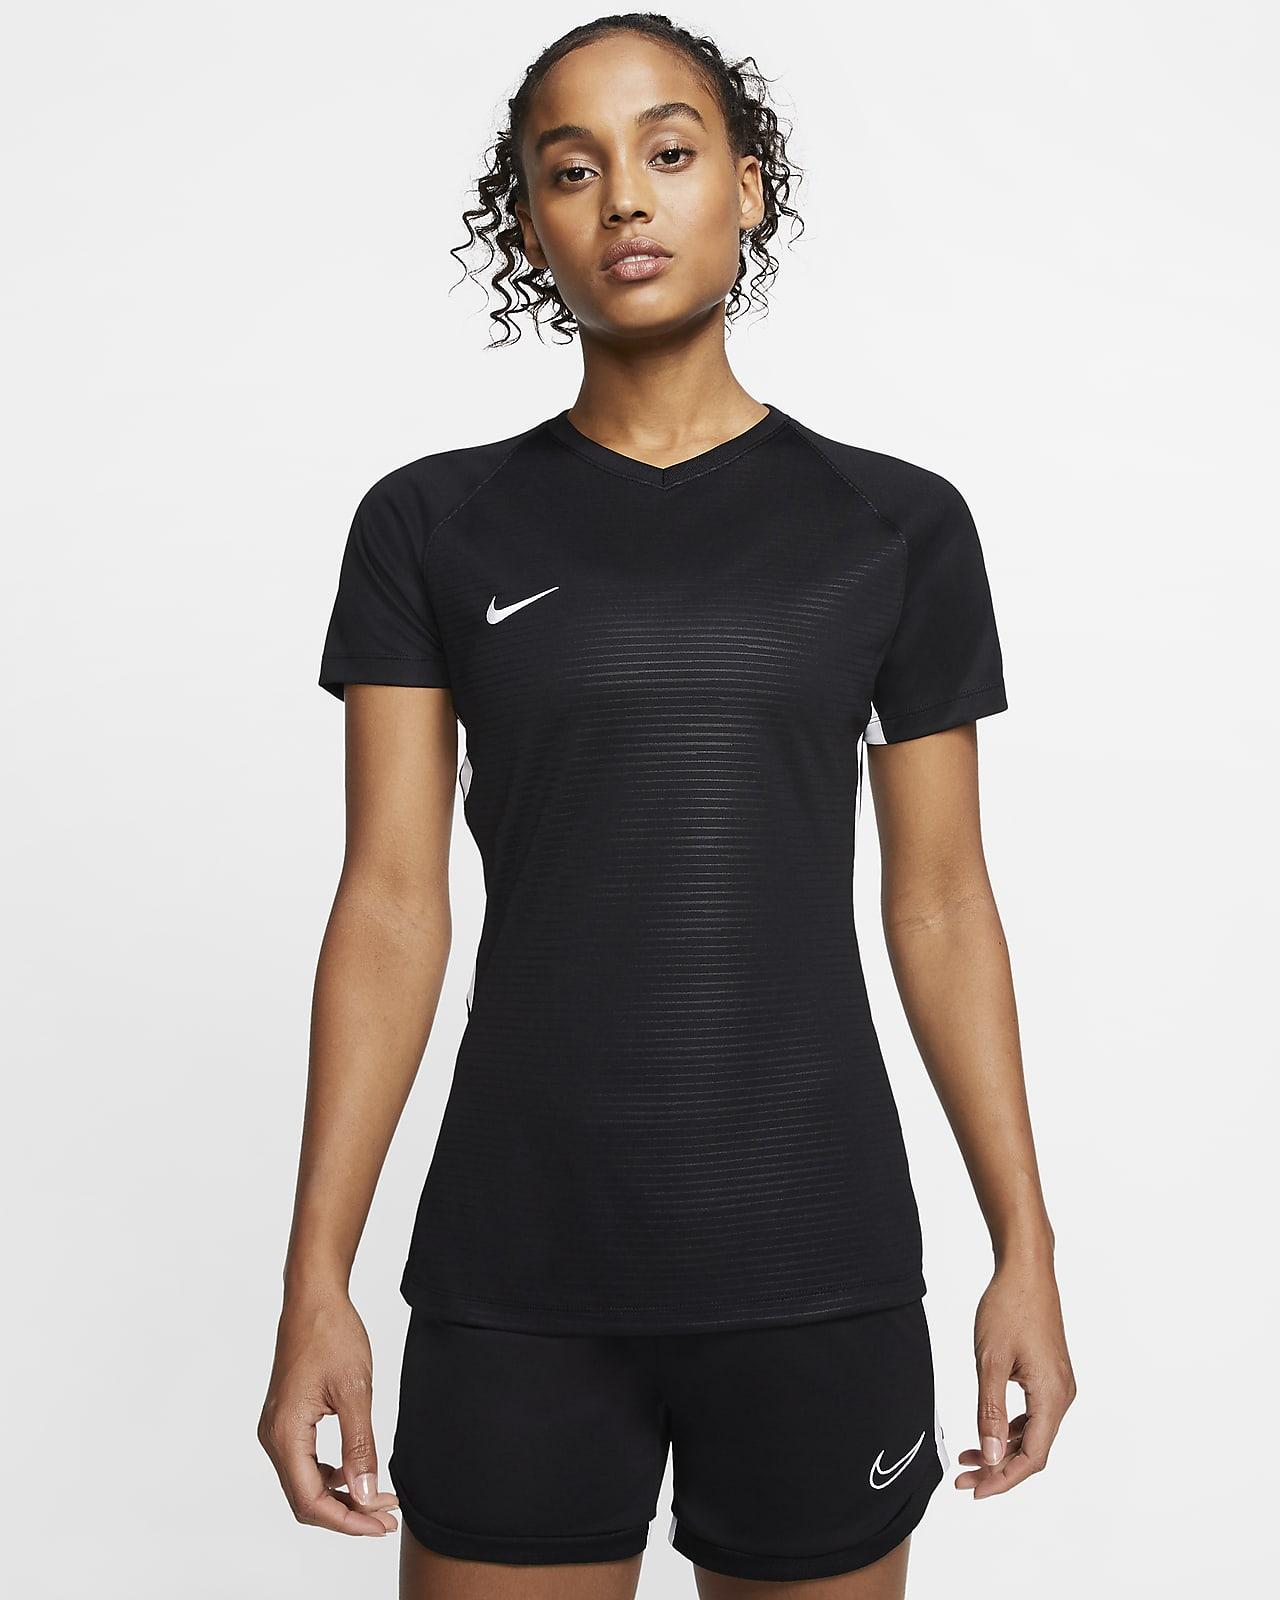 Nike Dri-FIT Tiempo Premier Women's Soccer Jersey